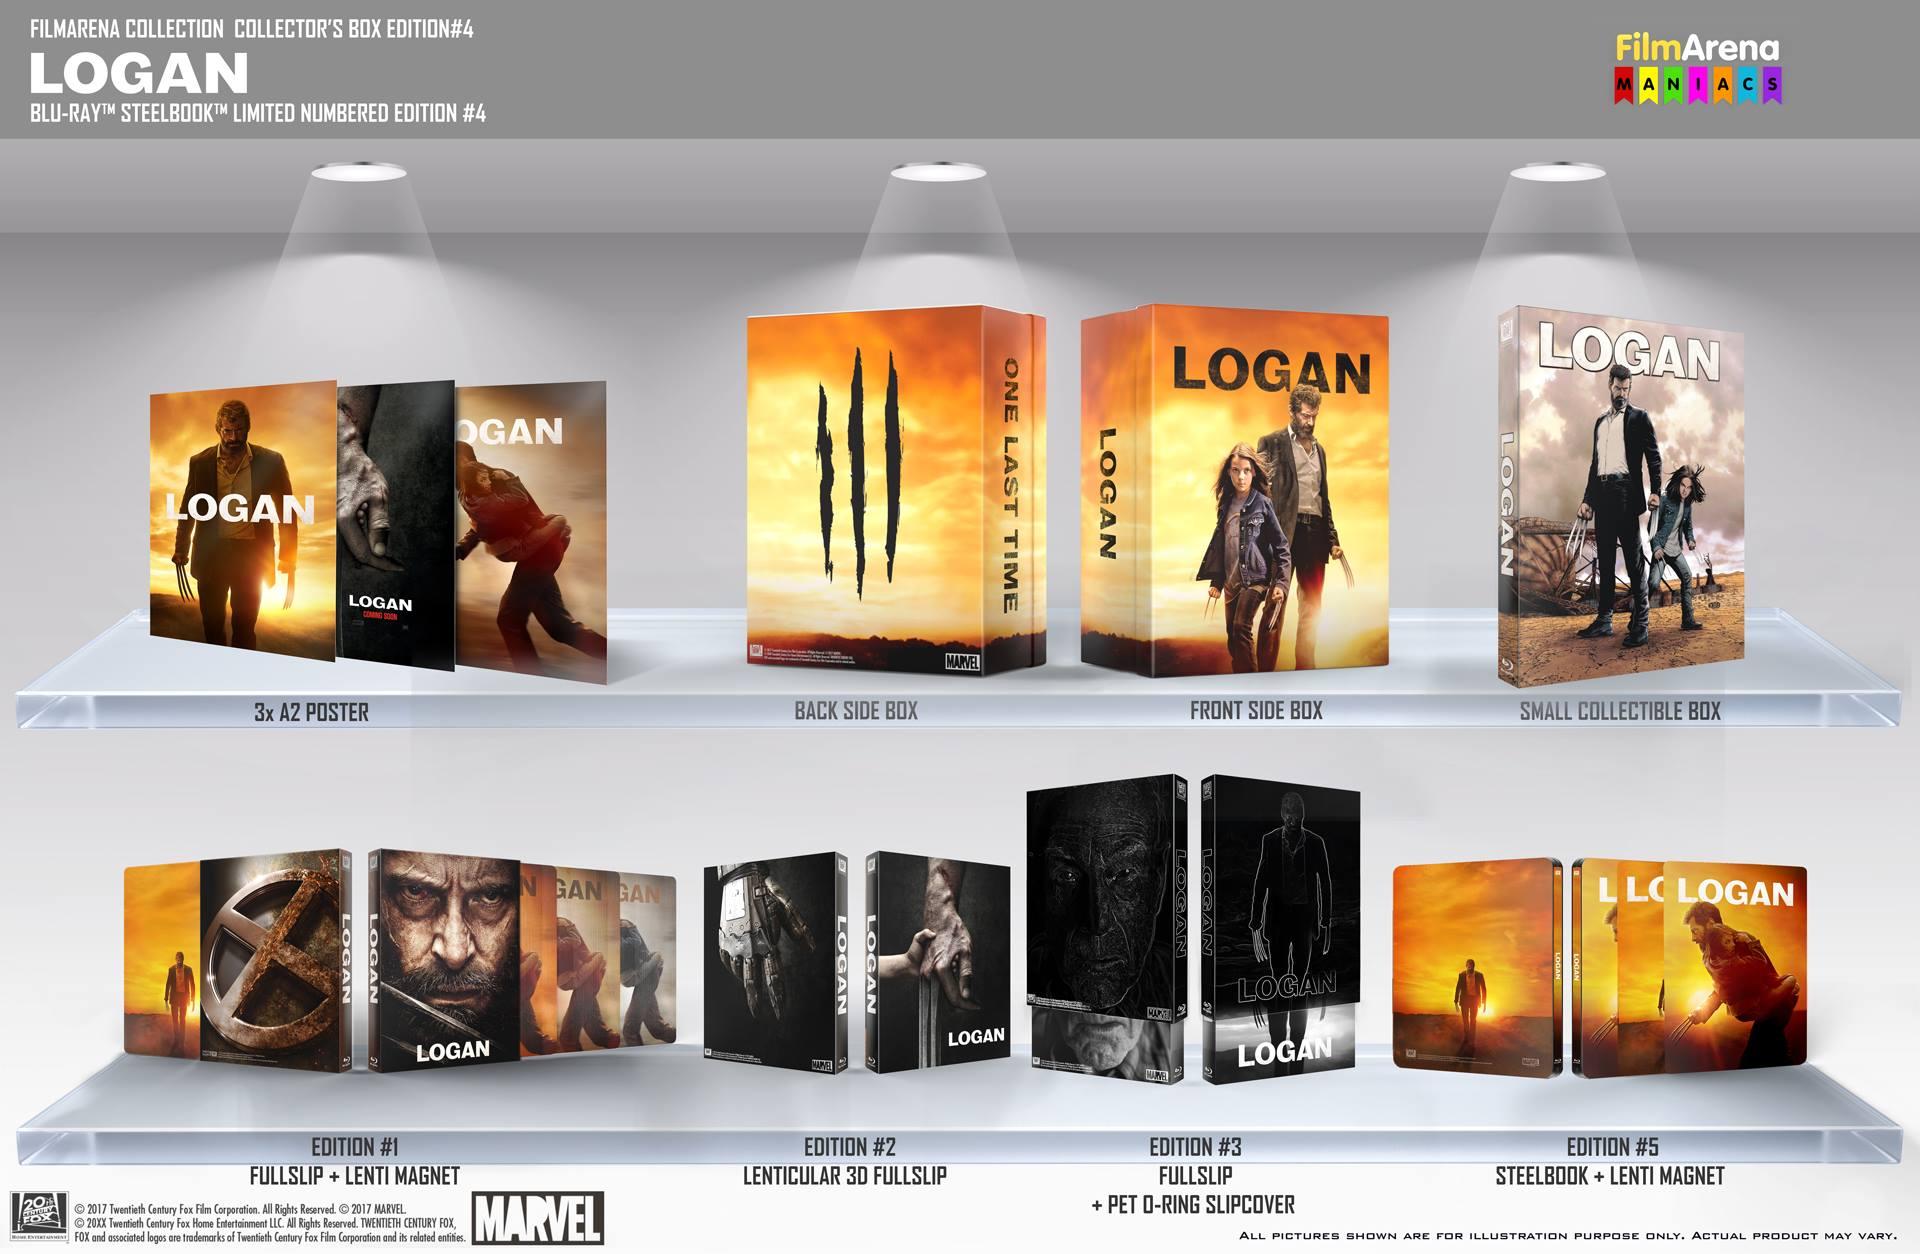 Logan edition 4